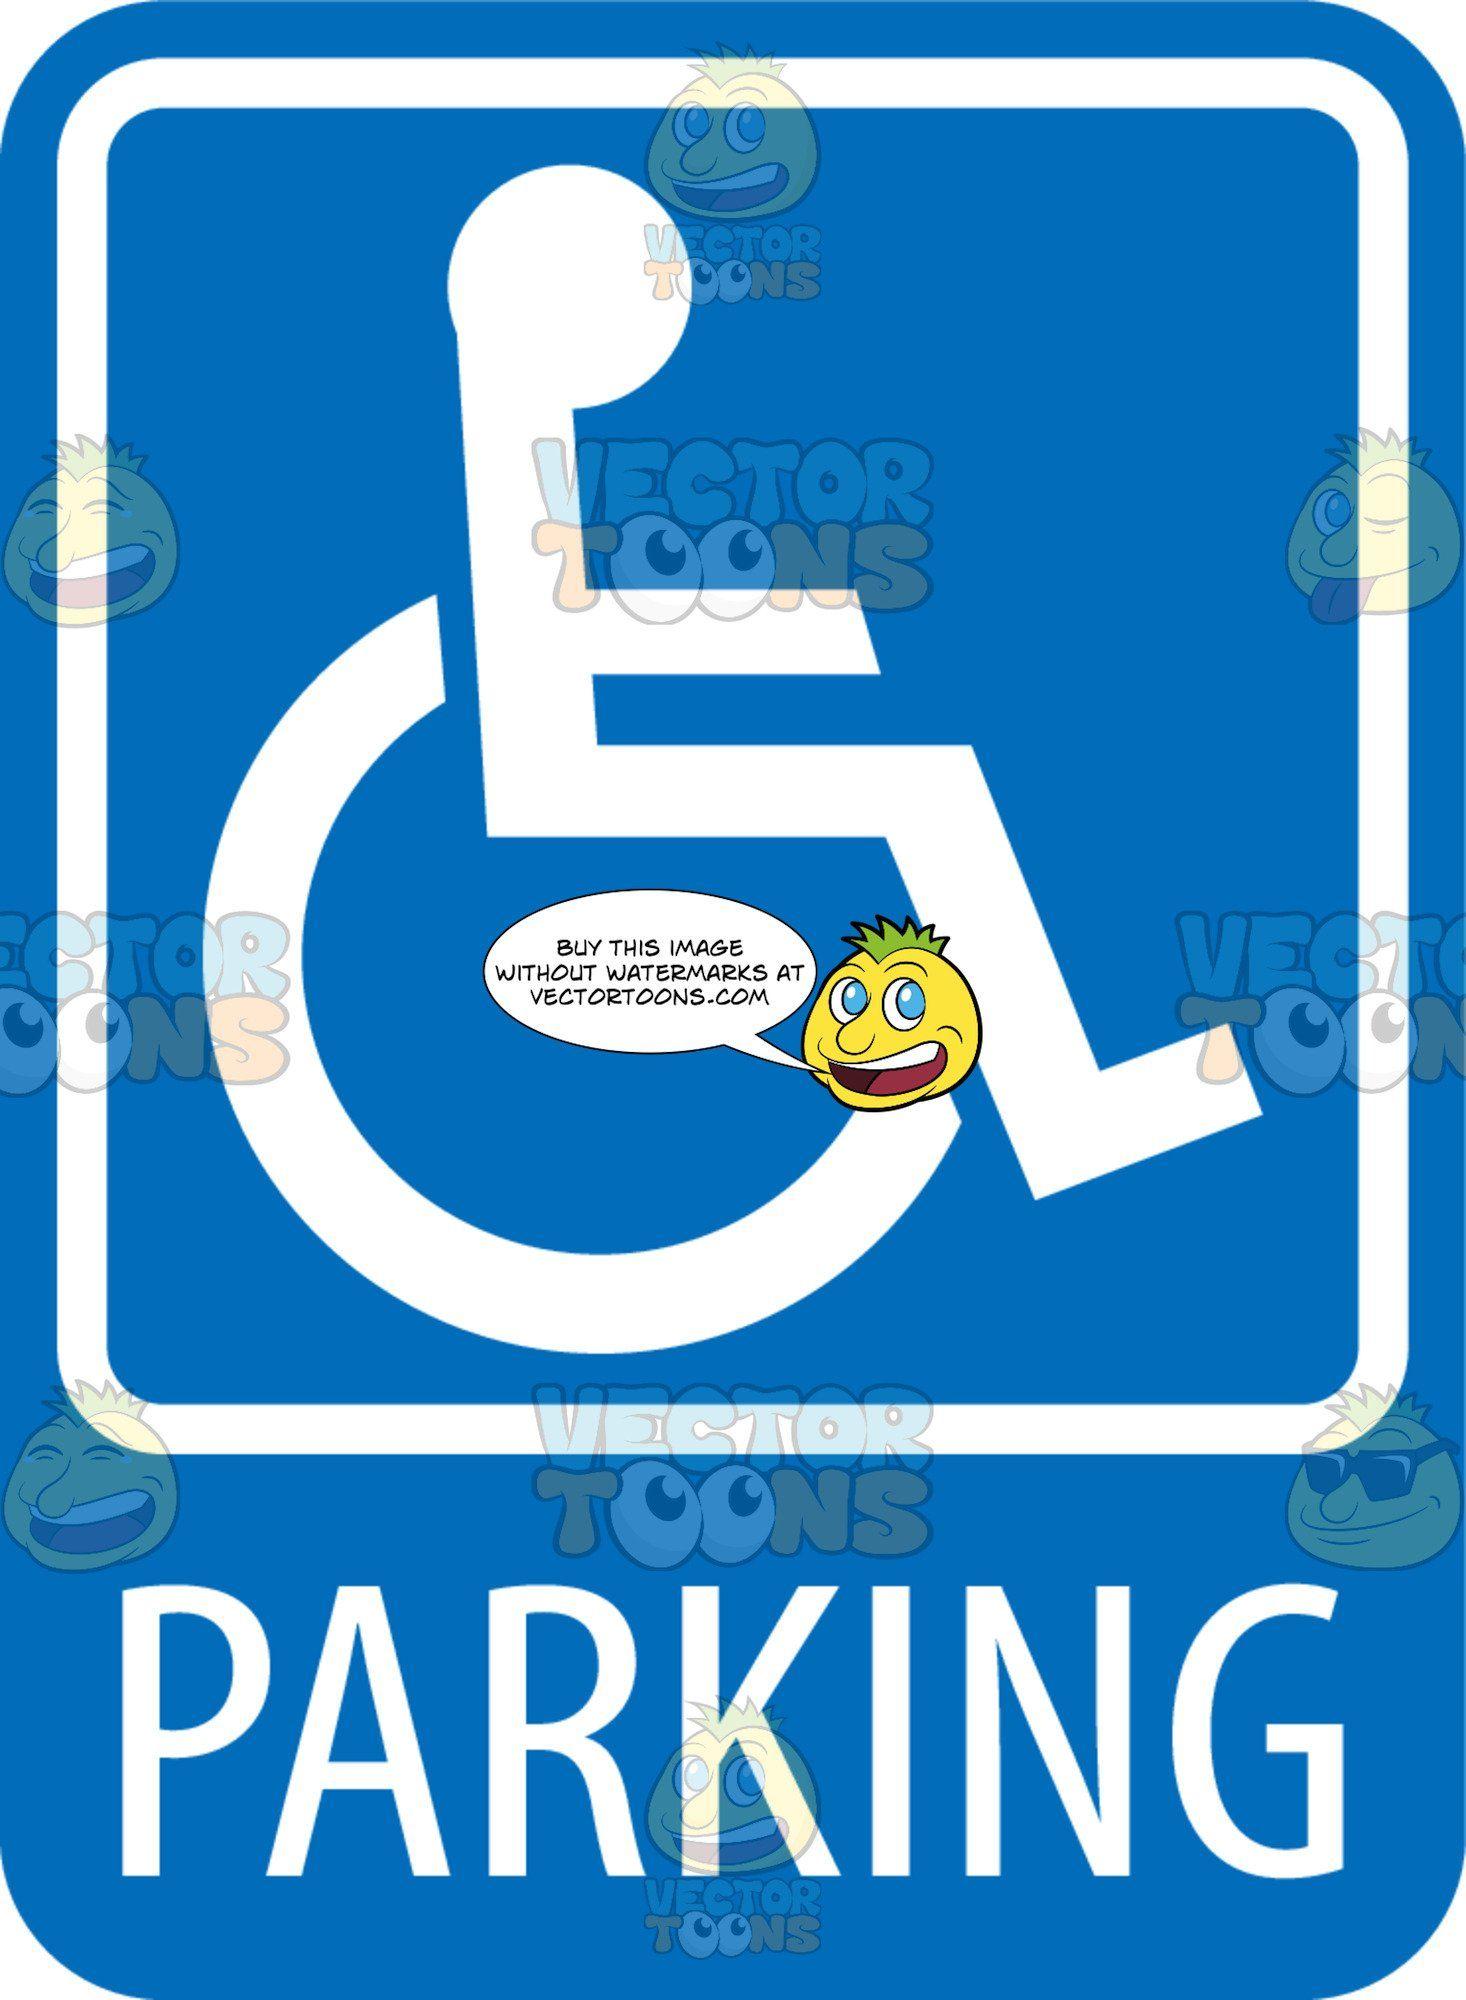 - Disabled Parking Sign Disabled Parking Sign, Park